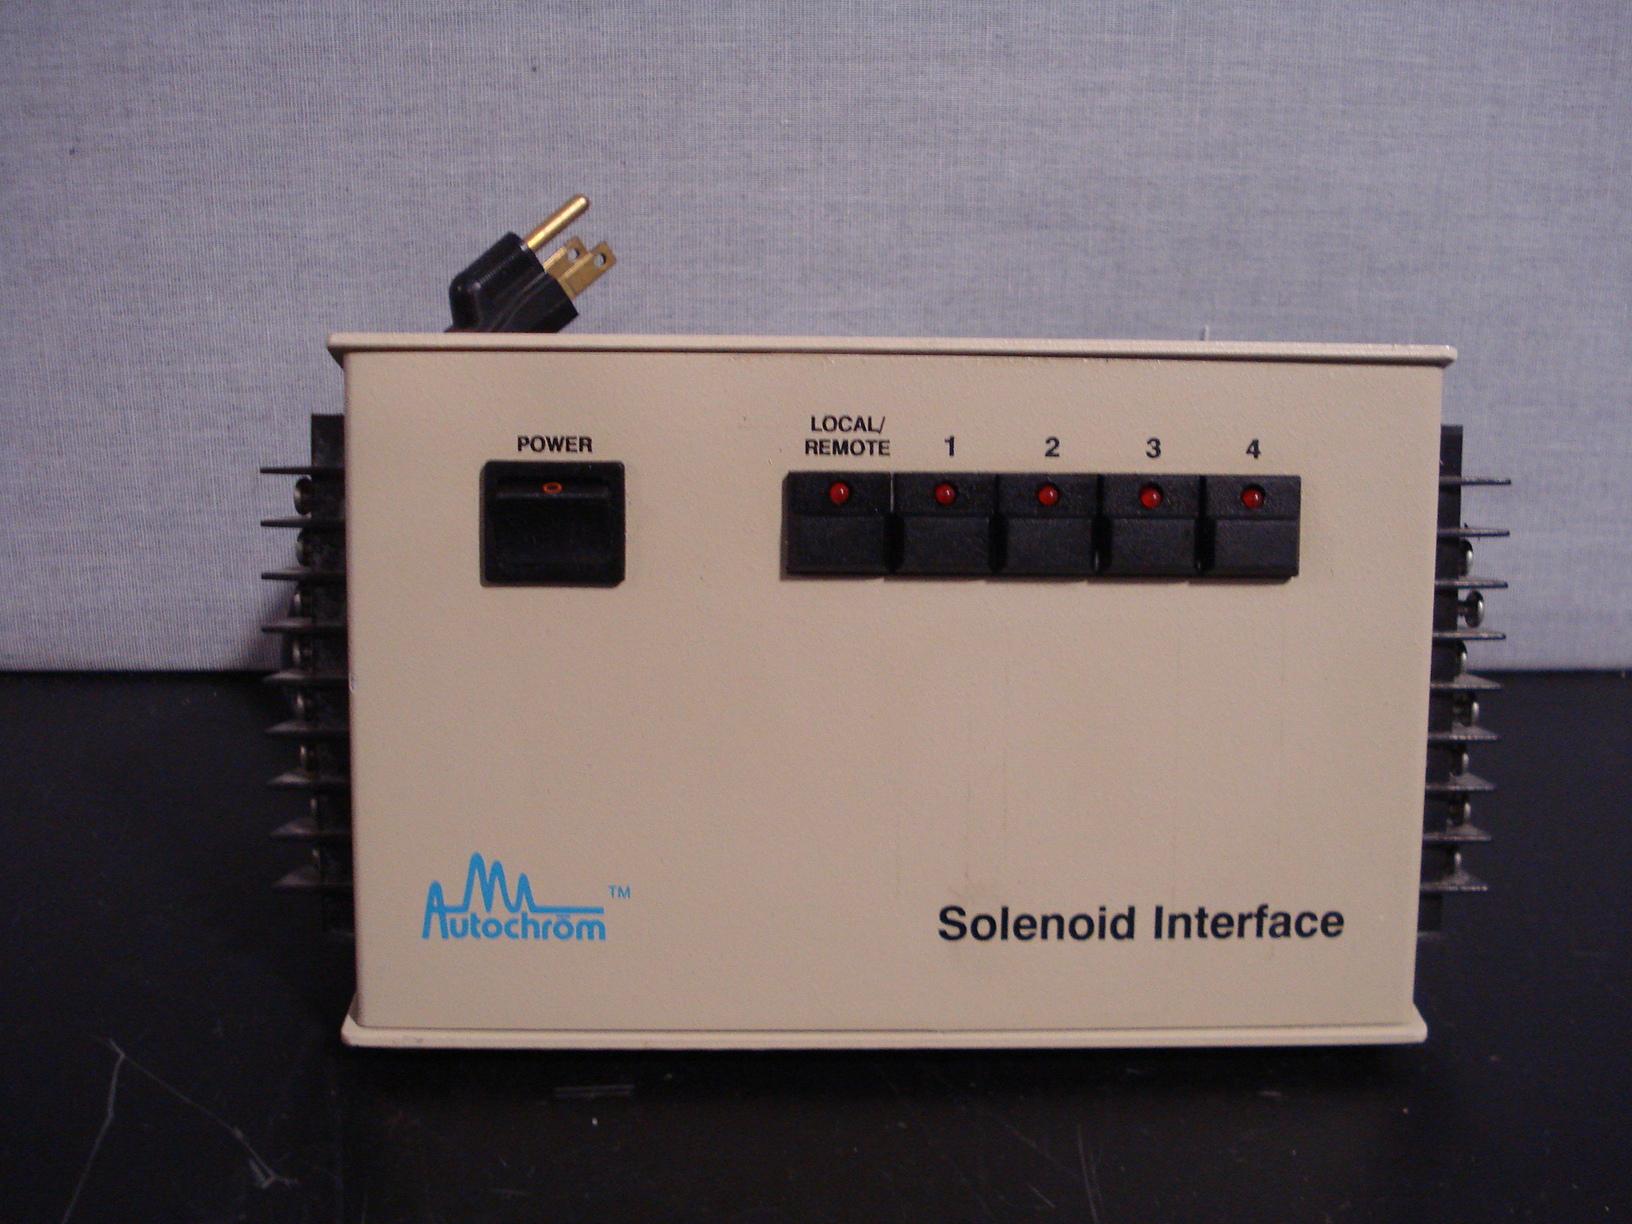 Autochrom Solenoid Interface Image